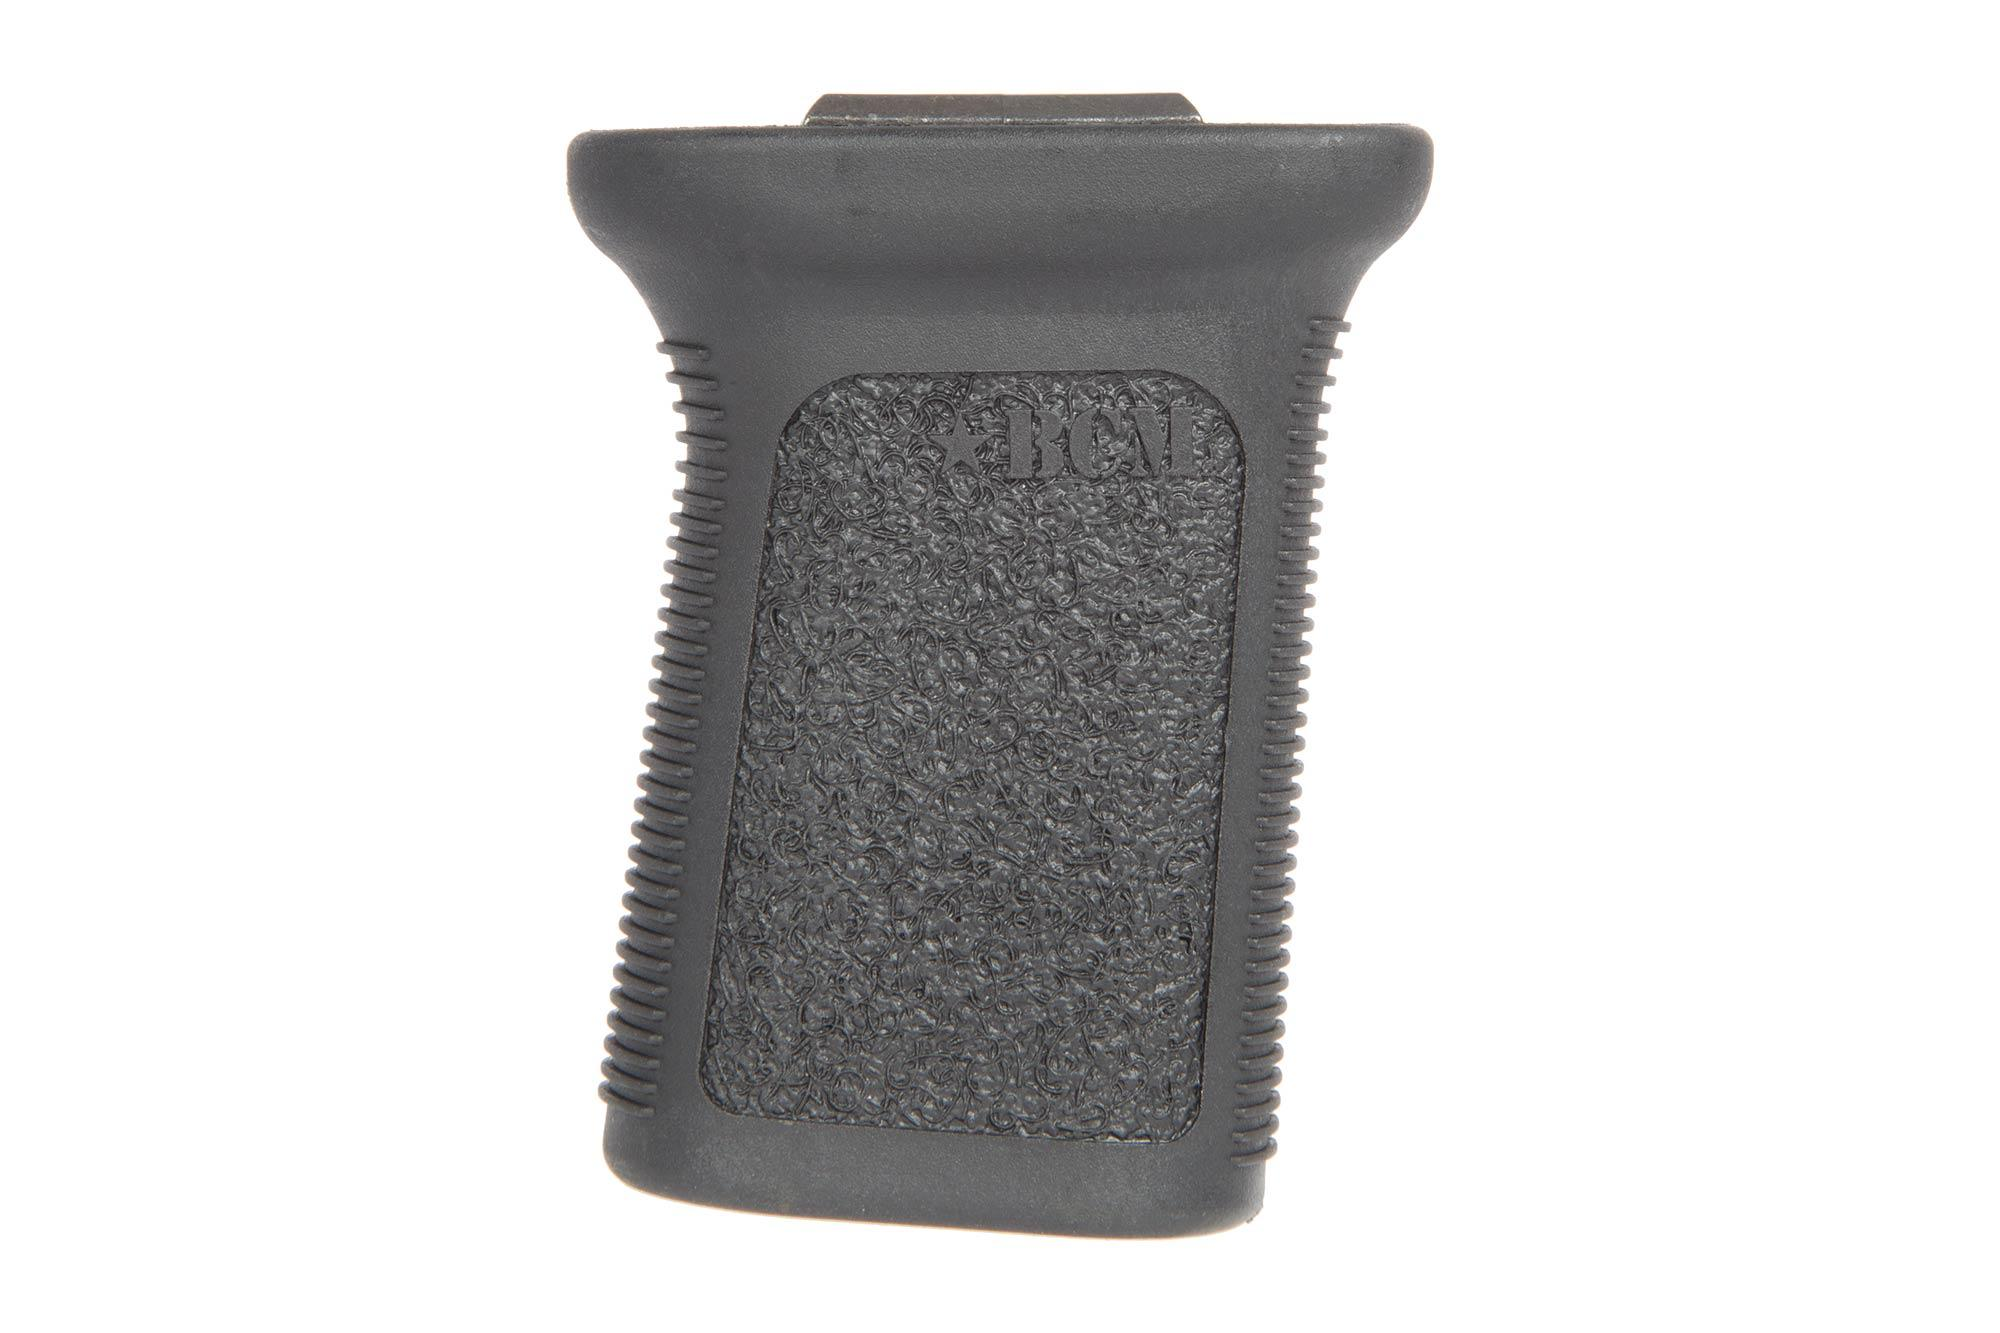 Bravo Company Manufacturing BCMGUNFIGHTER Vertical Grip Mod 3 - Picatinny - Black